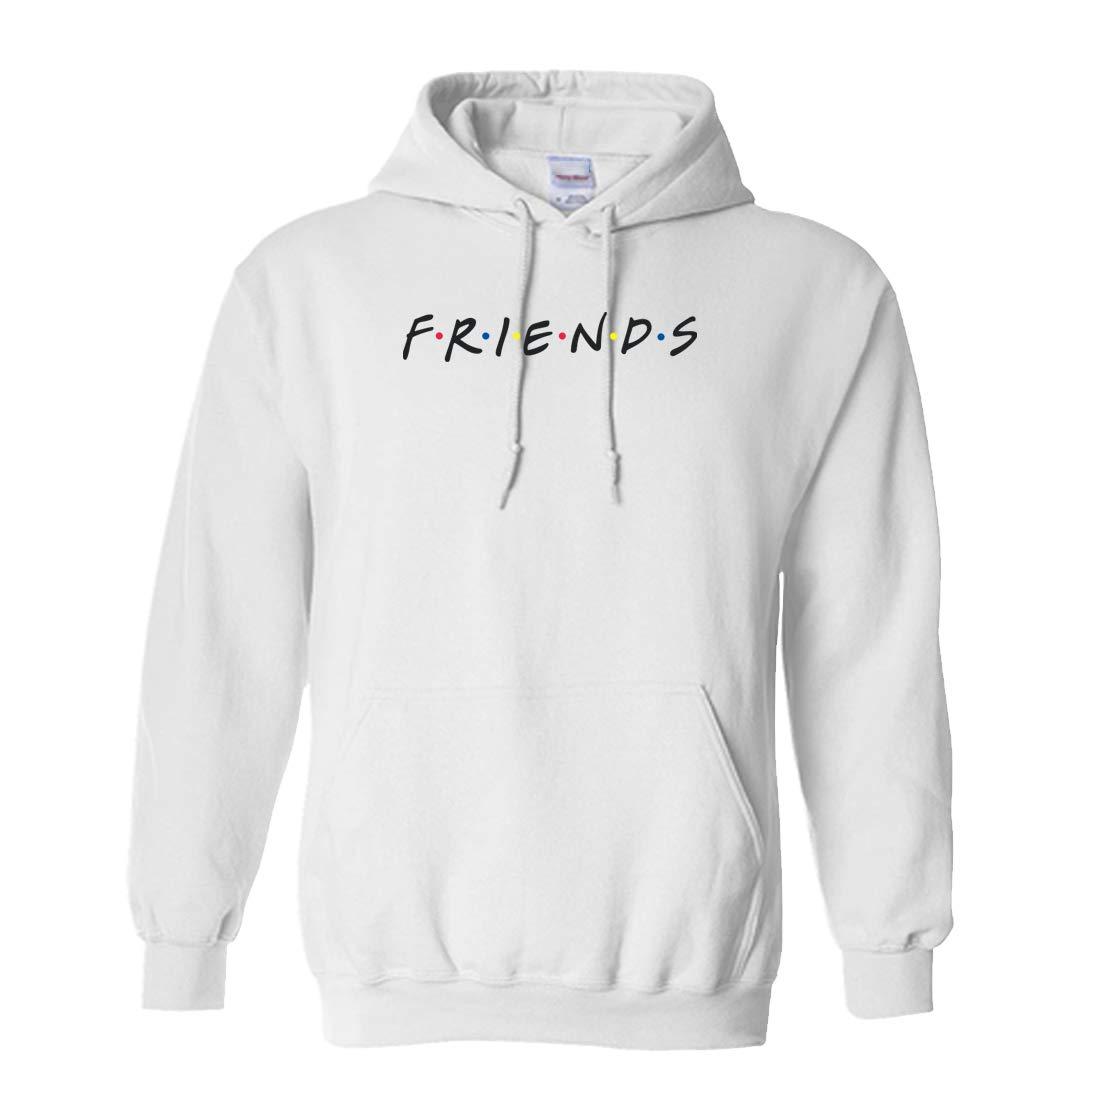 CLOTHING WORLD Friends Black Unisex Hoodie